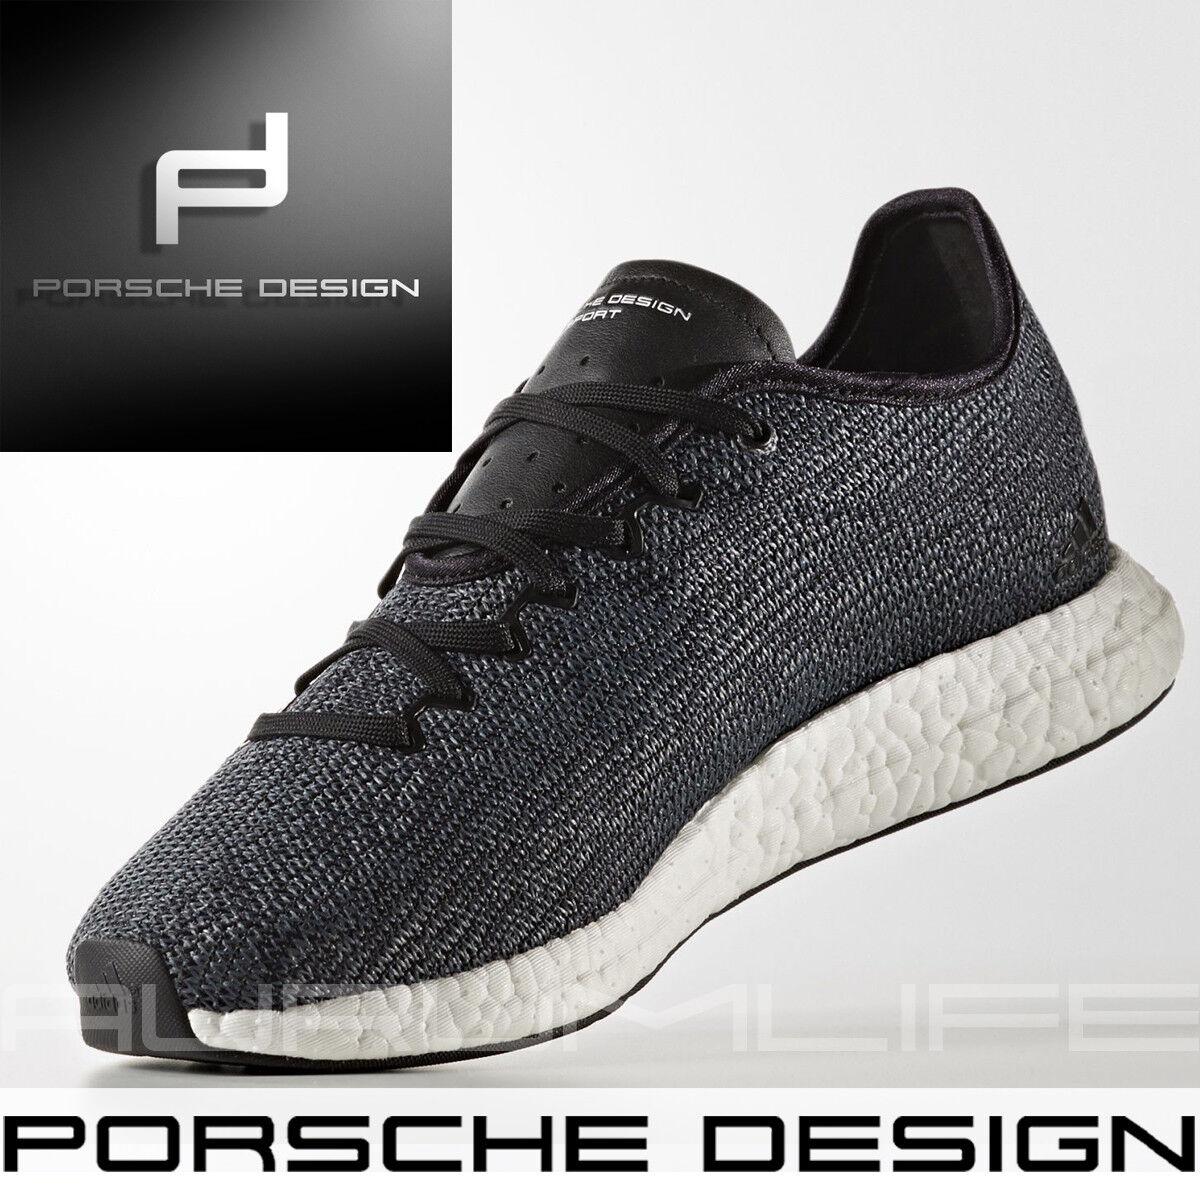 Adidas Porsche Ξ£Ο‡Ξ΅Ξ΄ΞΉΞ±ΟƒΞΌΟŒΟ' Travel Tourer Boost Παπούτσια Ξ±Ξ½Ξ±Ο€Ξ�δηση Mens ΔΡρμάτινο BB5540